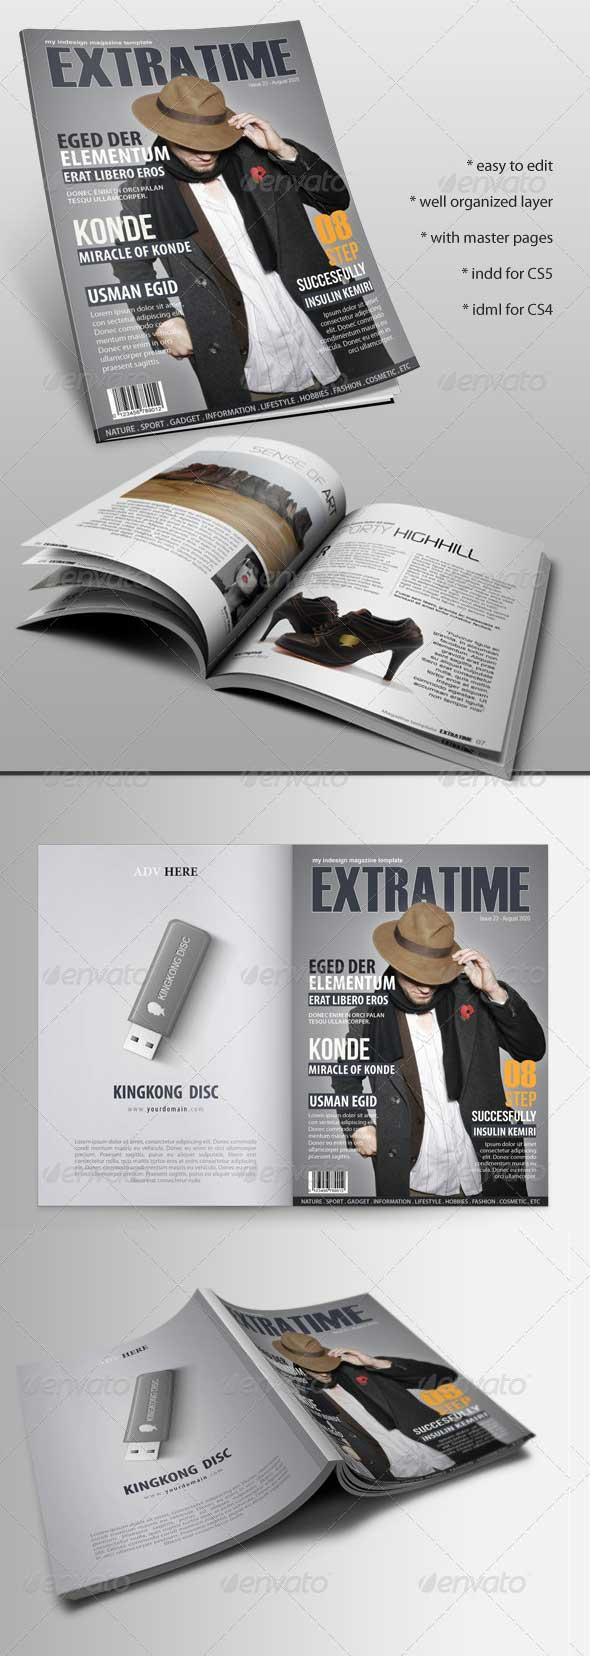 extratime-magazine-template